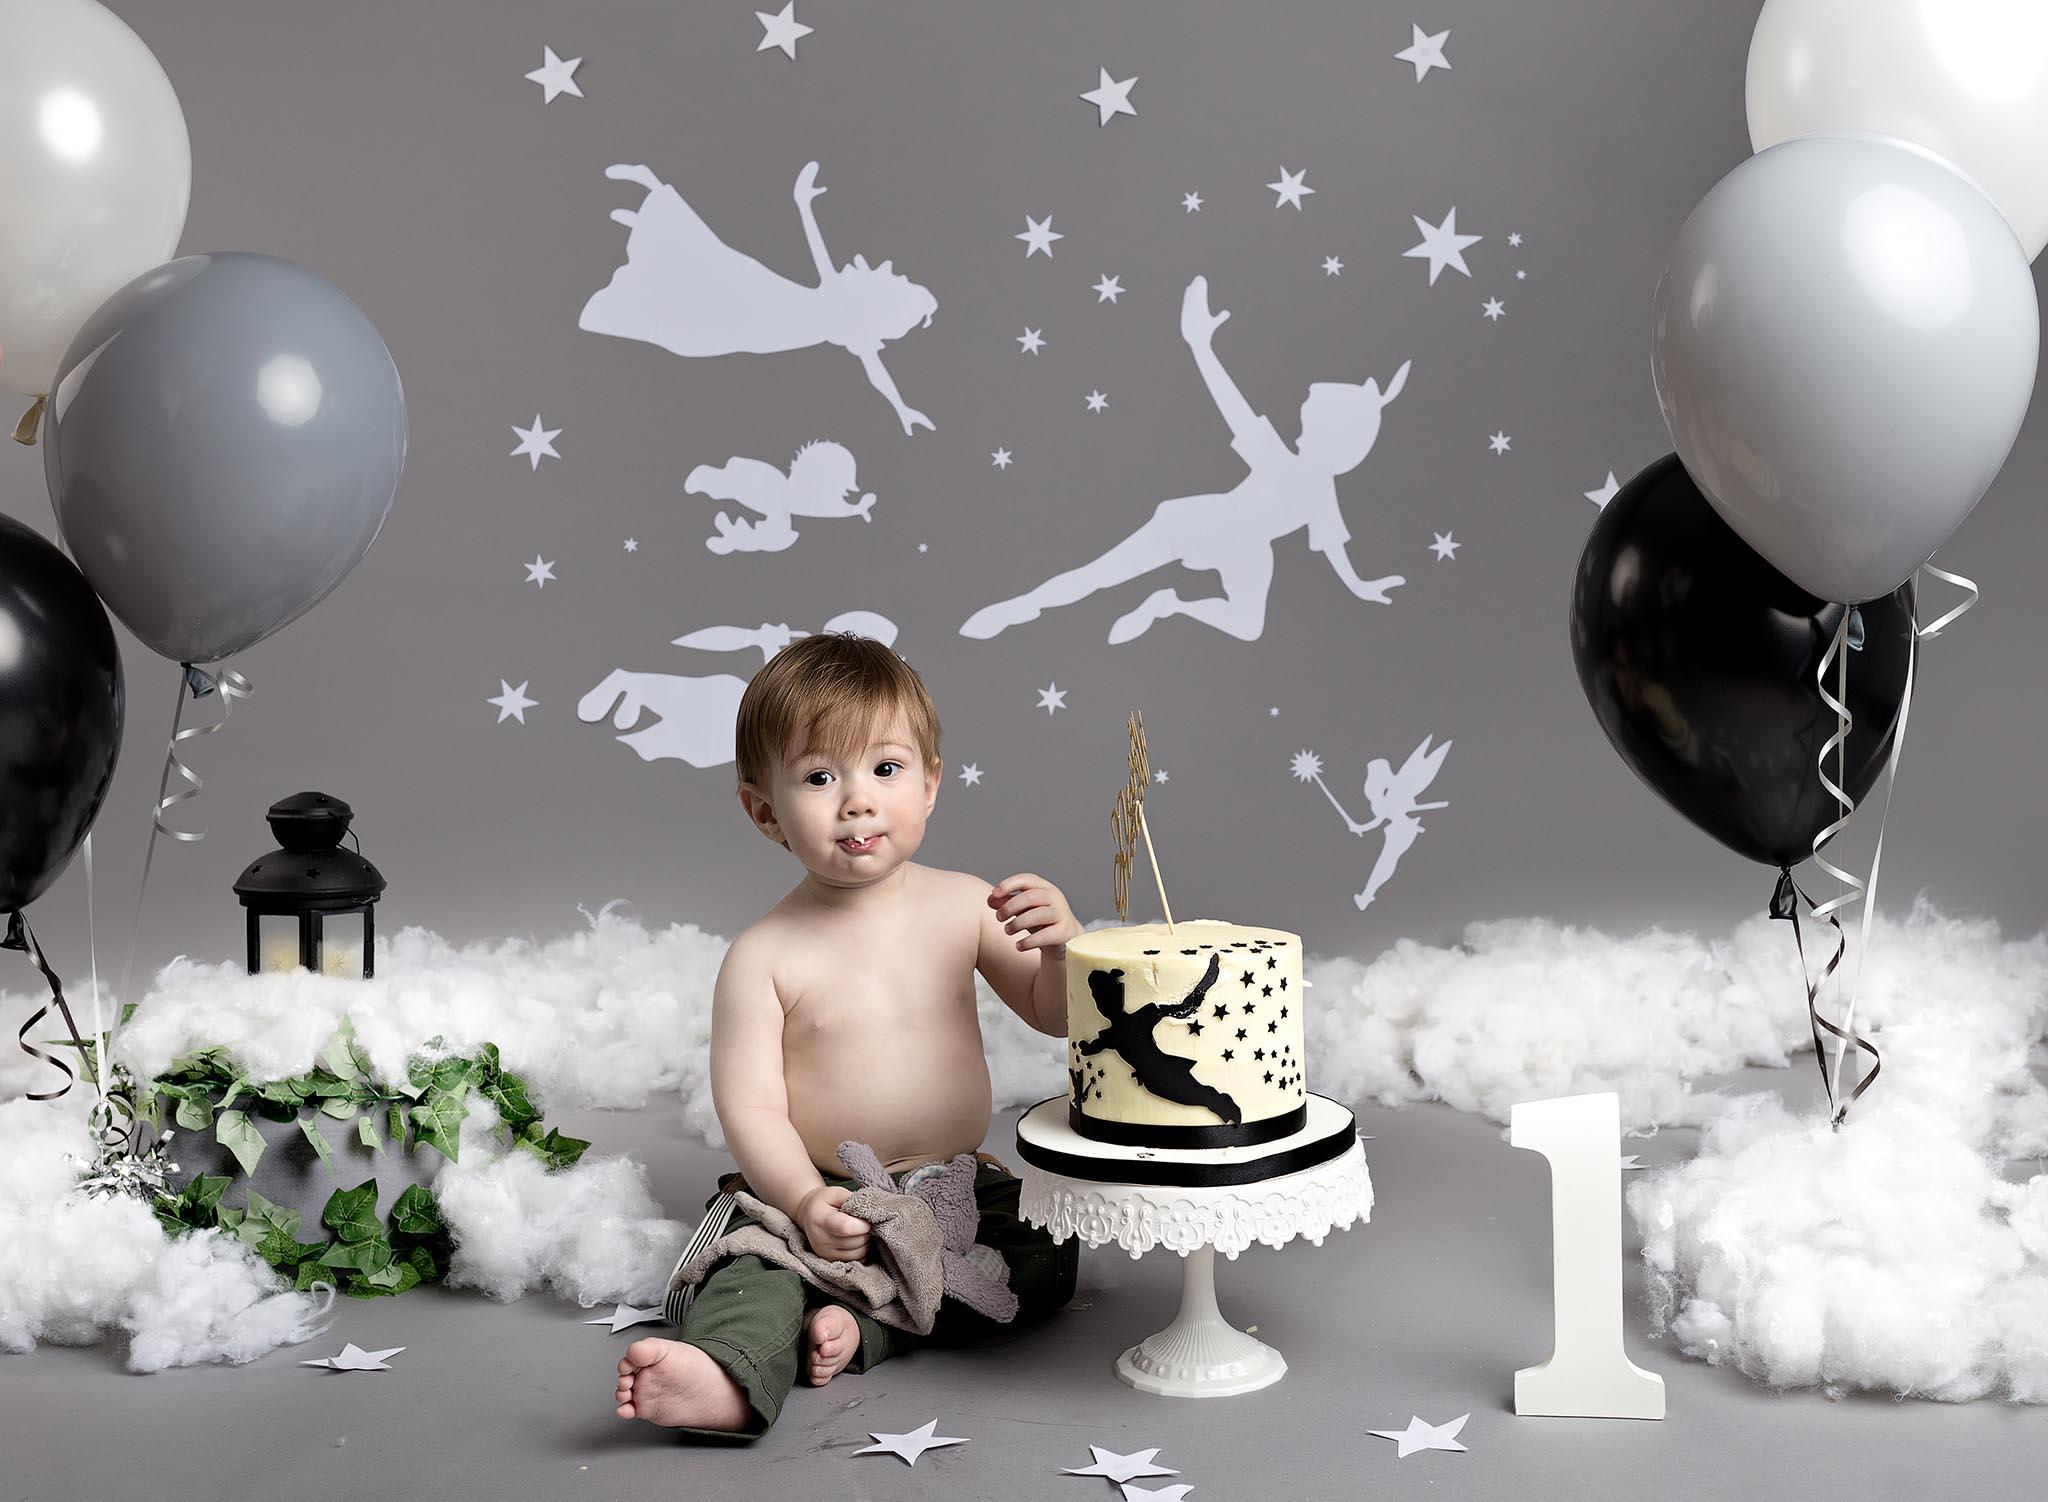 Boys 1st Birthday cake smash photography session